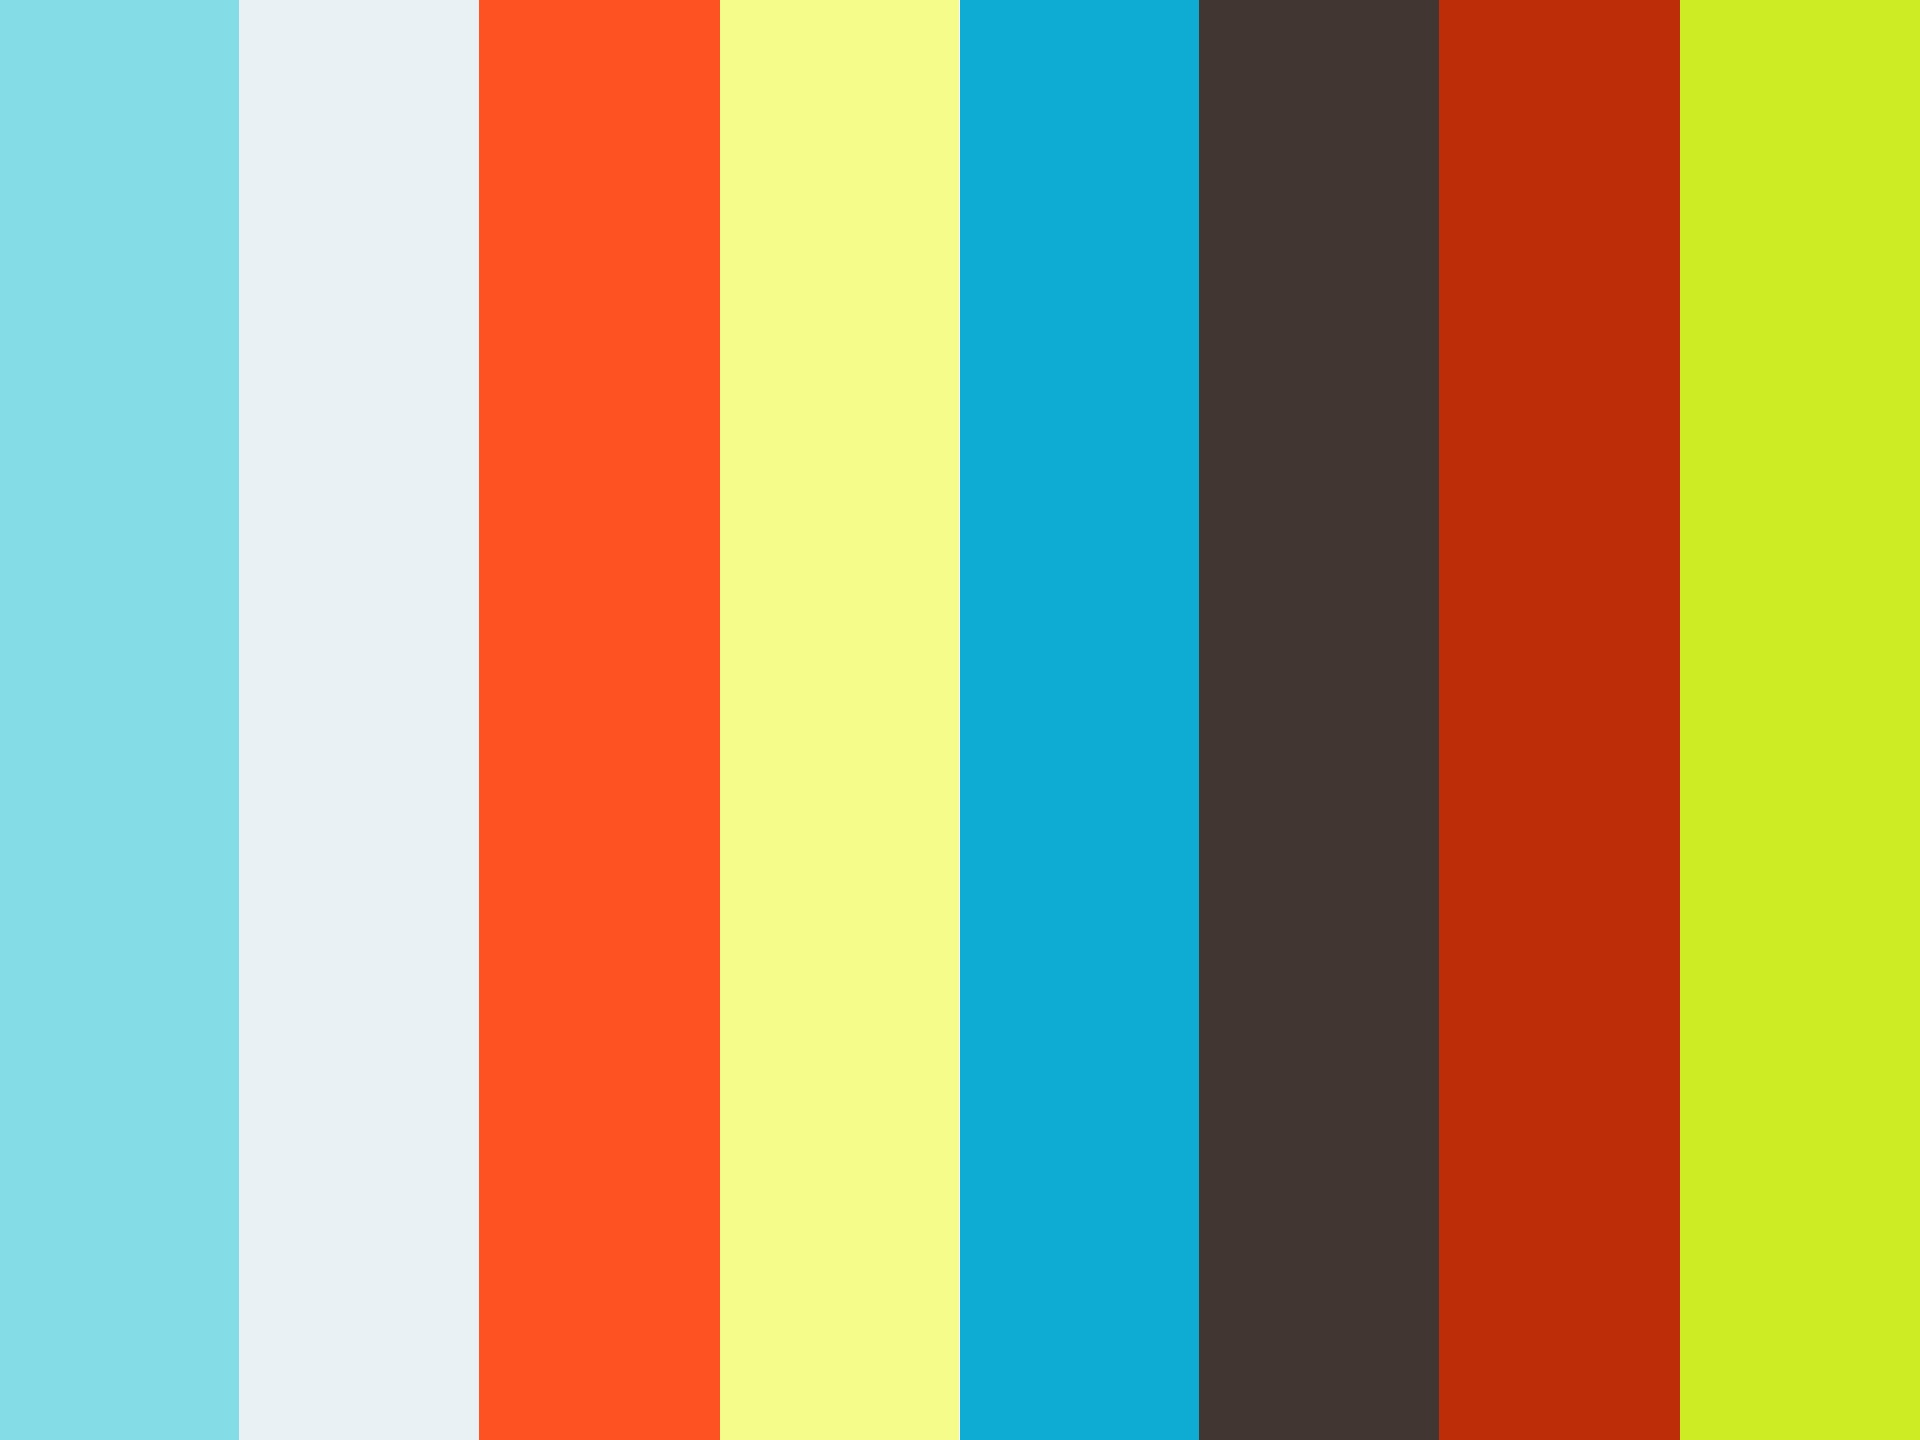 Roxy Music • Both Ends Burning • Live at Wembley 1975